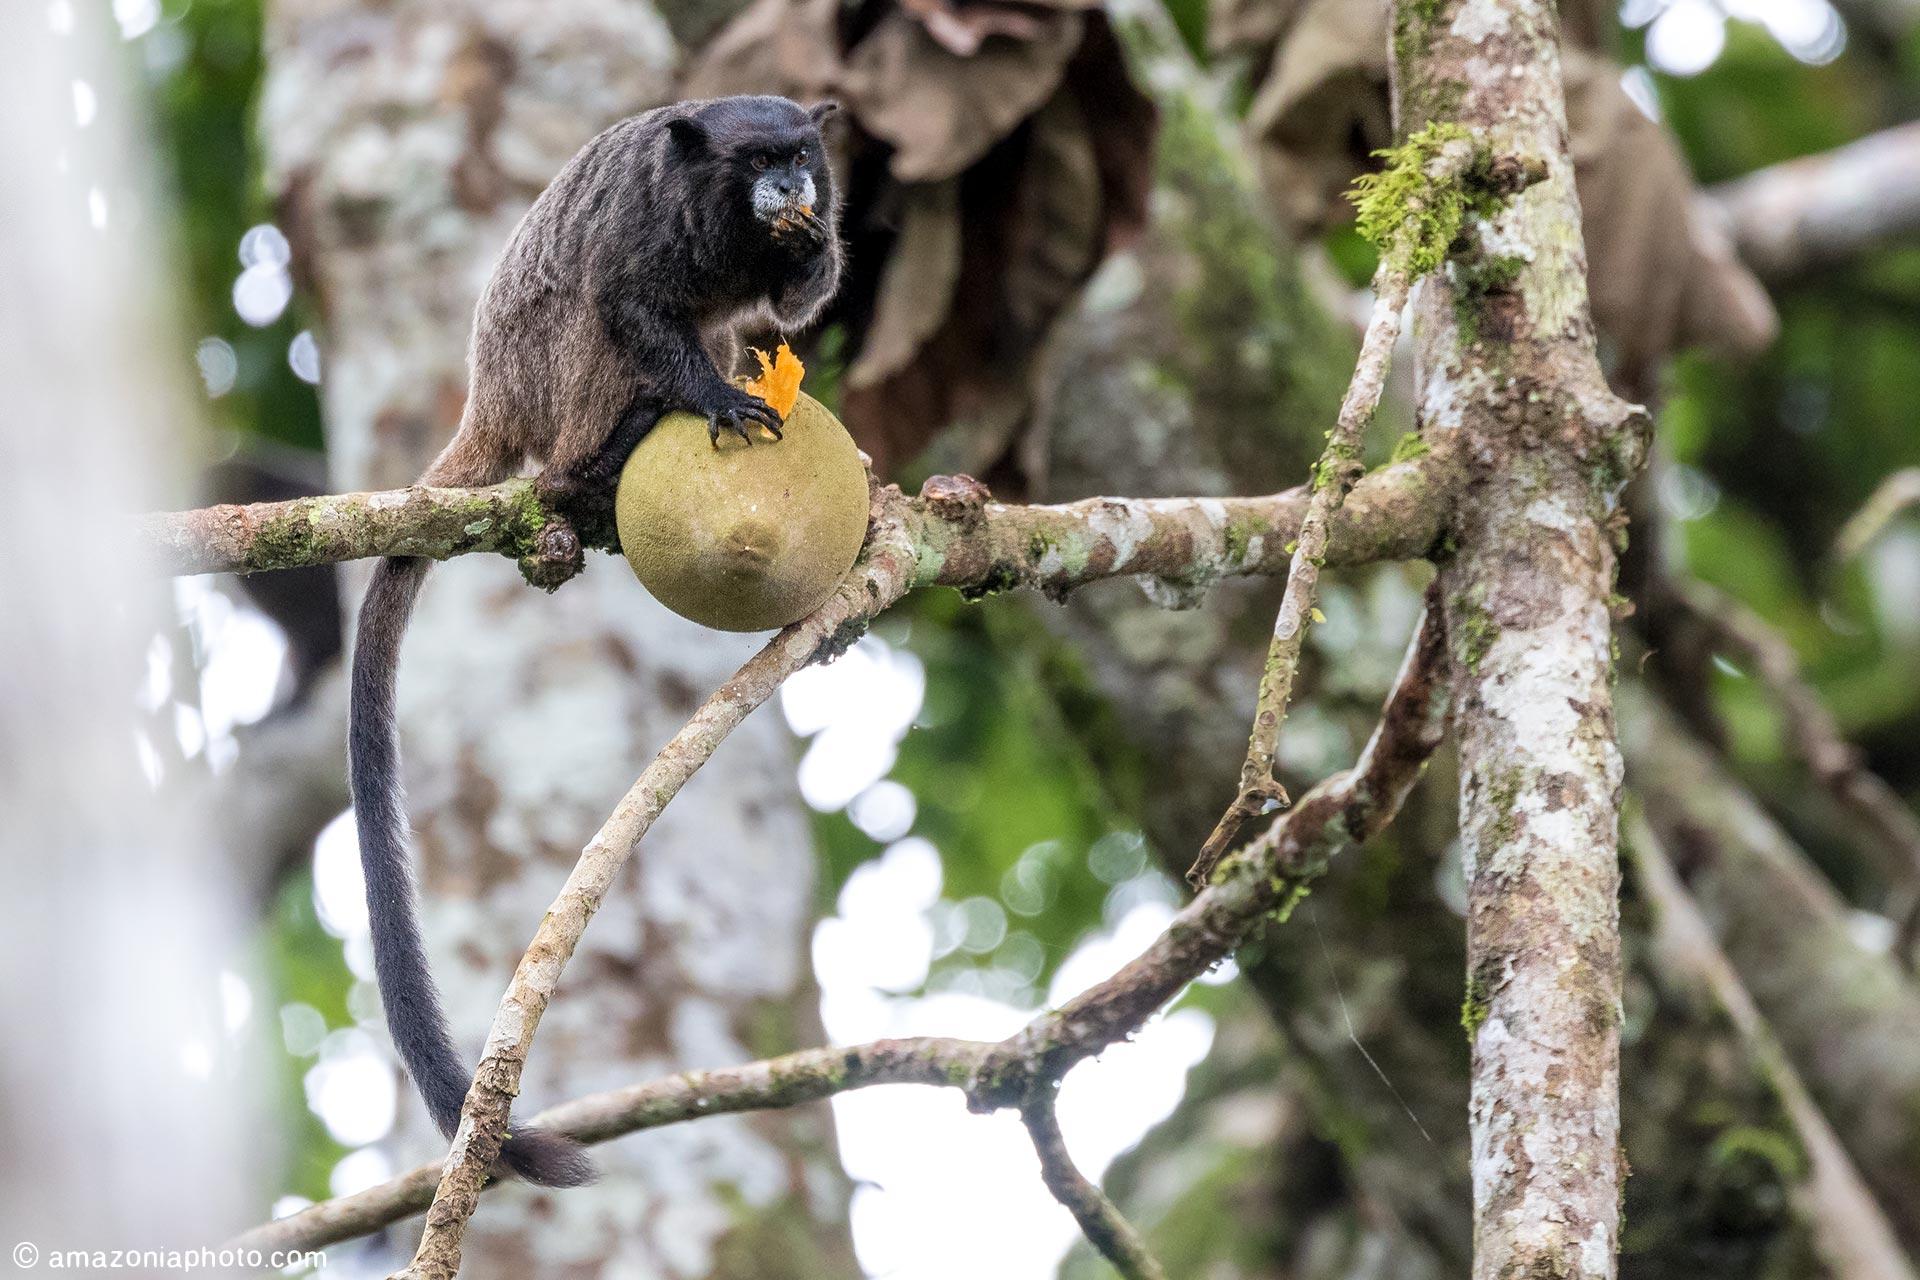 Black-mantled Tamarin (Leontocebus nigricollis)